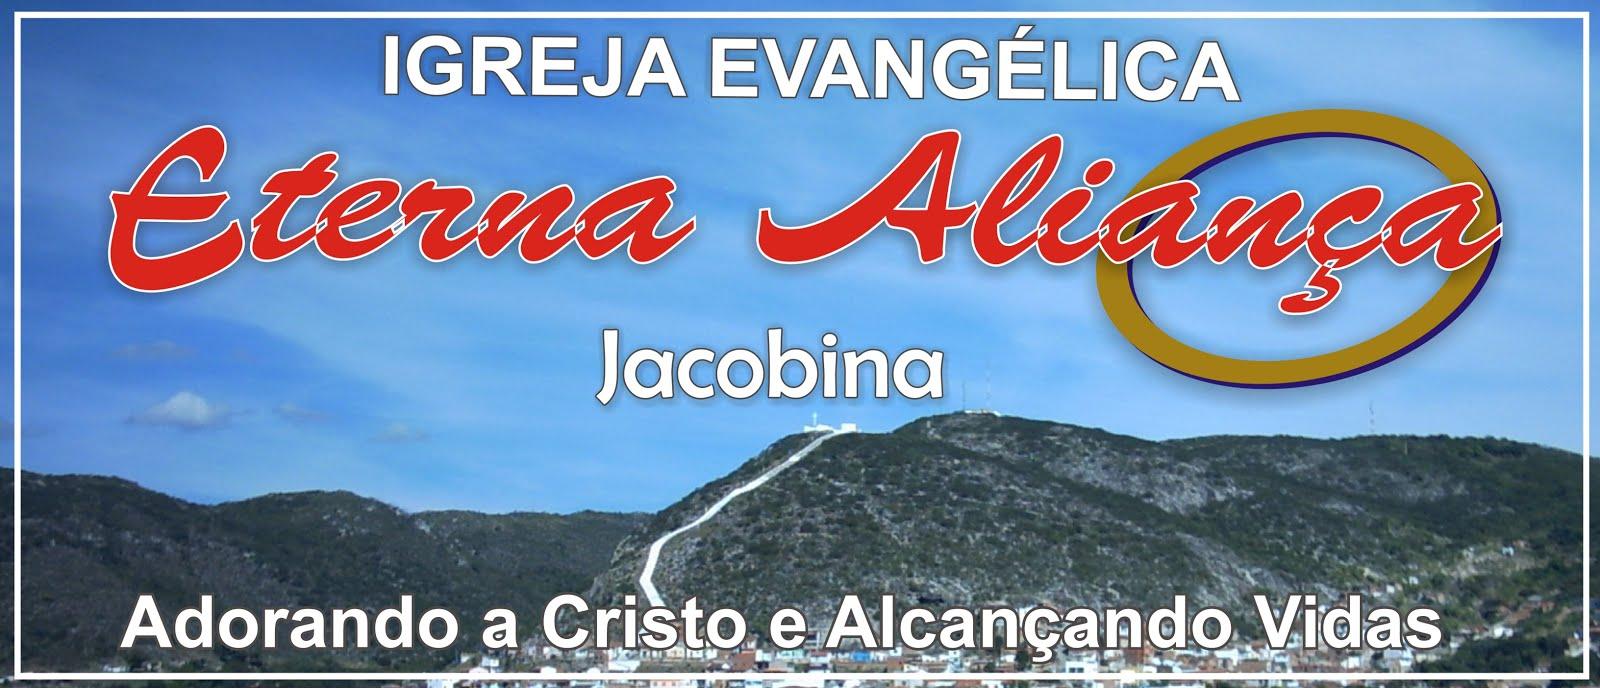 Igreja Evangélica Eterna Aliança - Jacobina (BA)